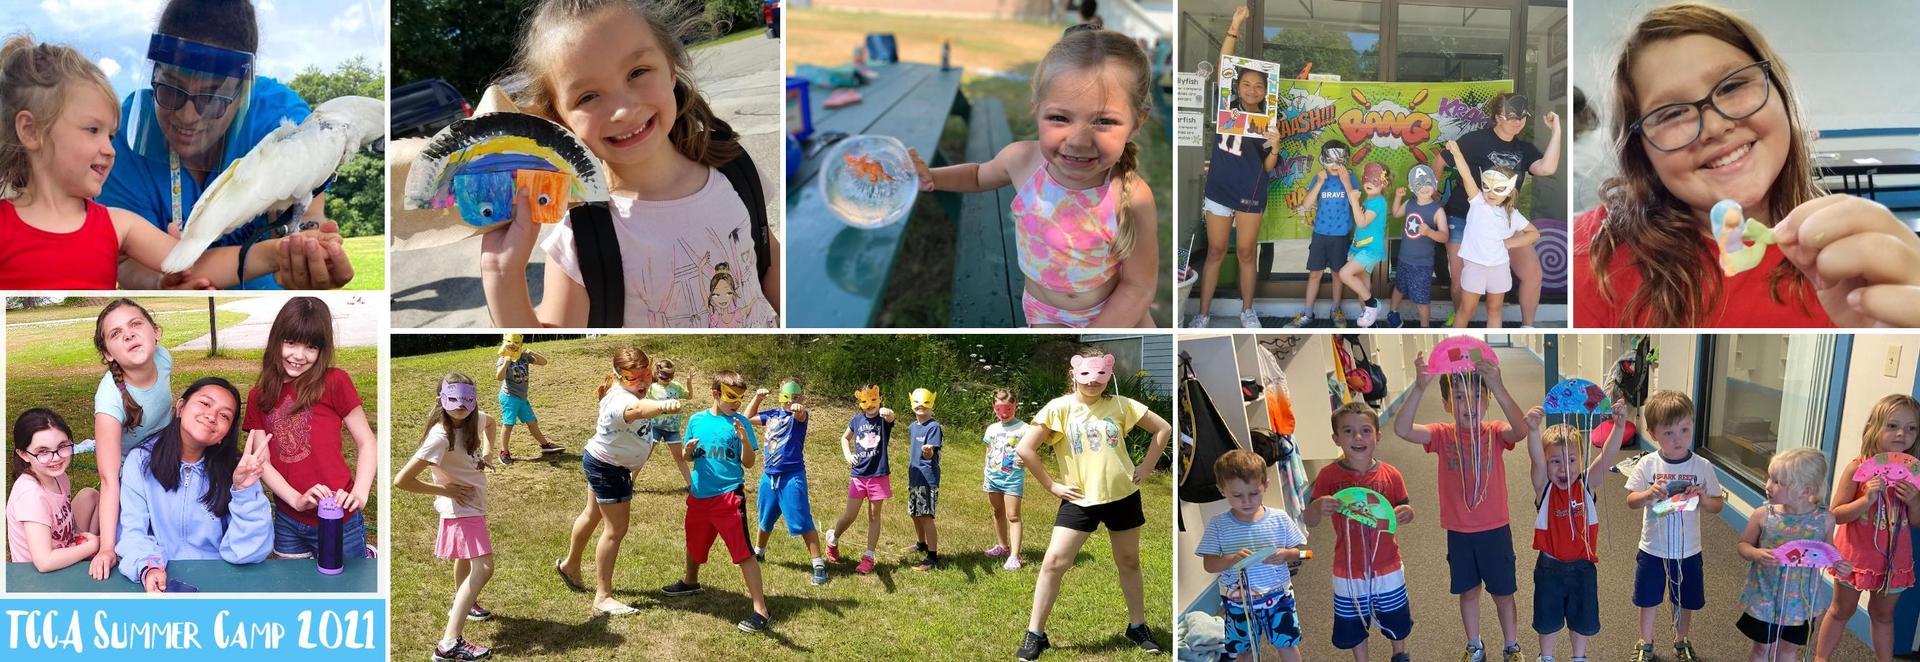 Summer Camp collage